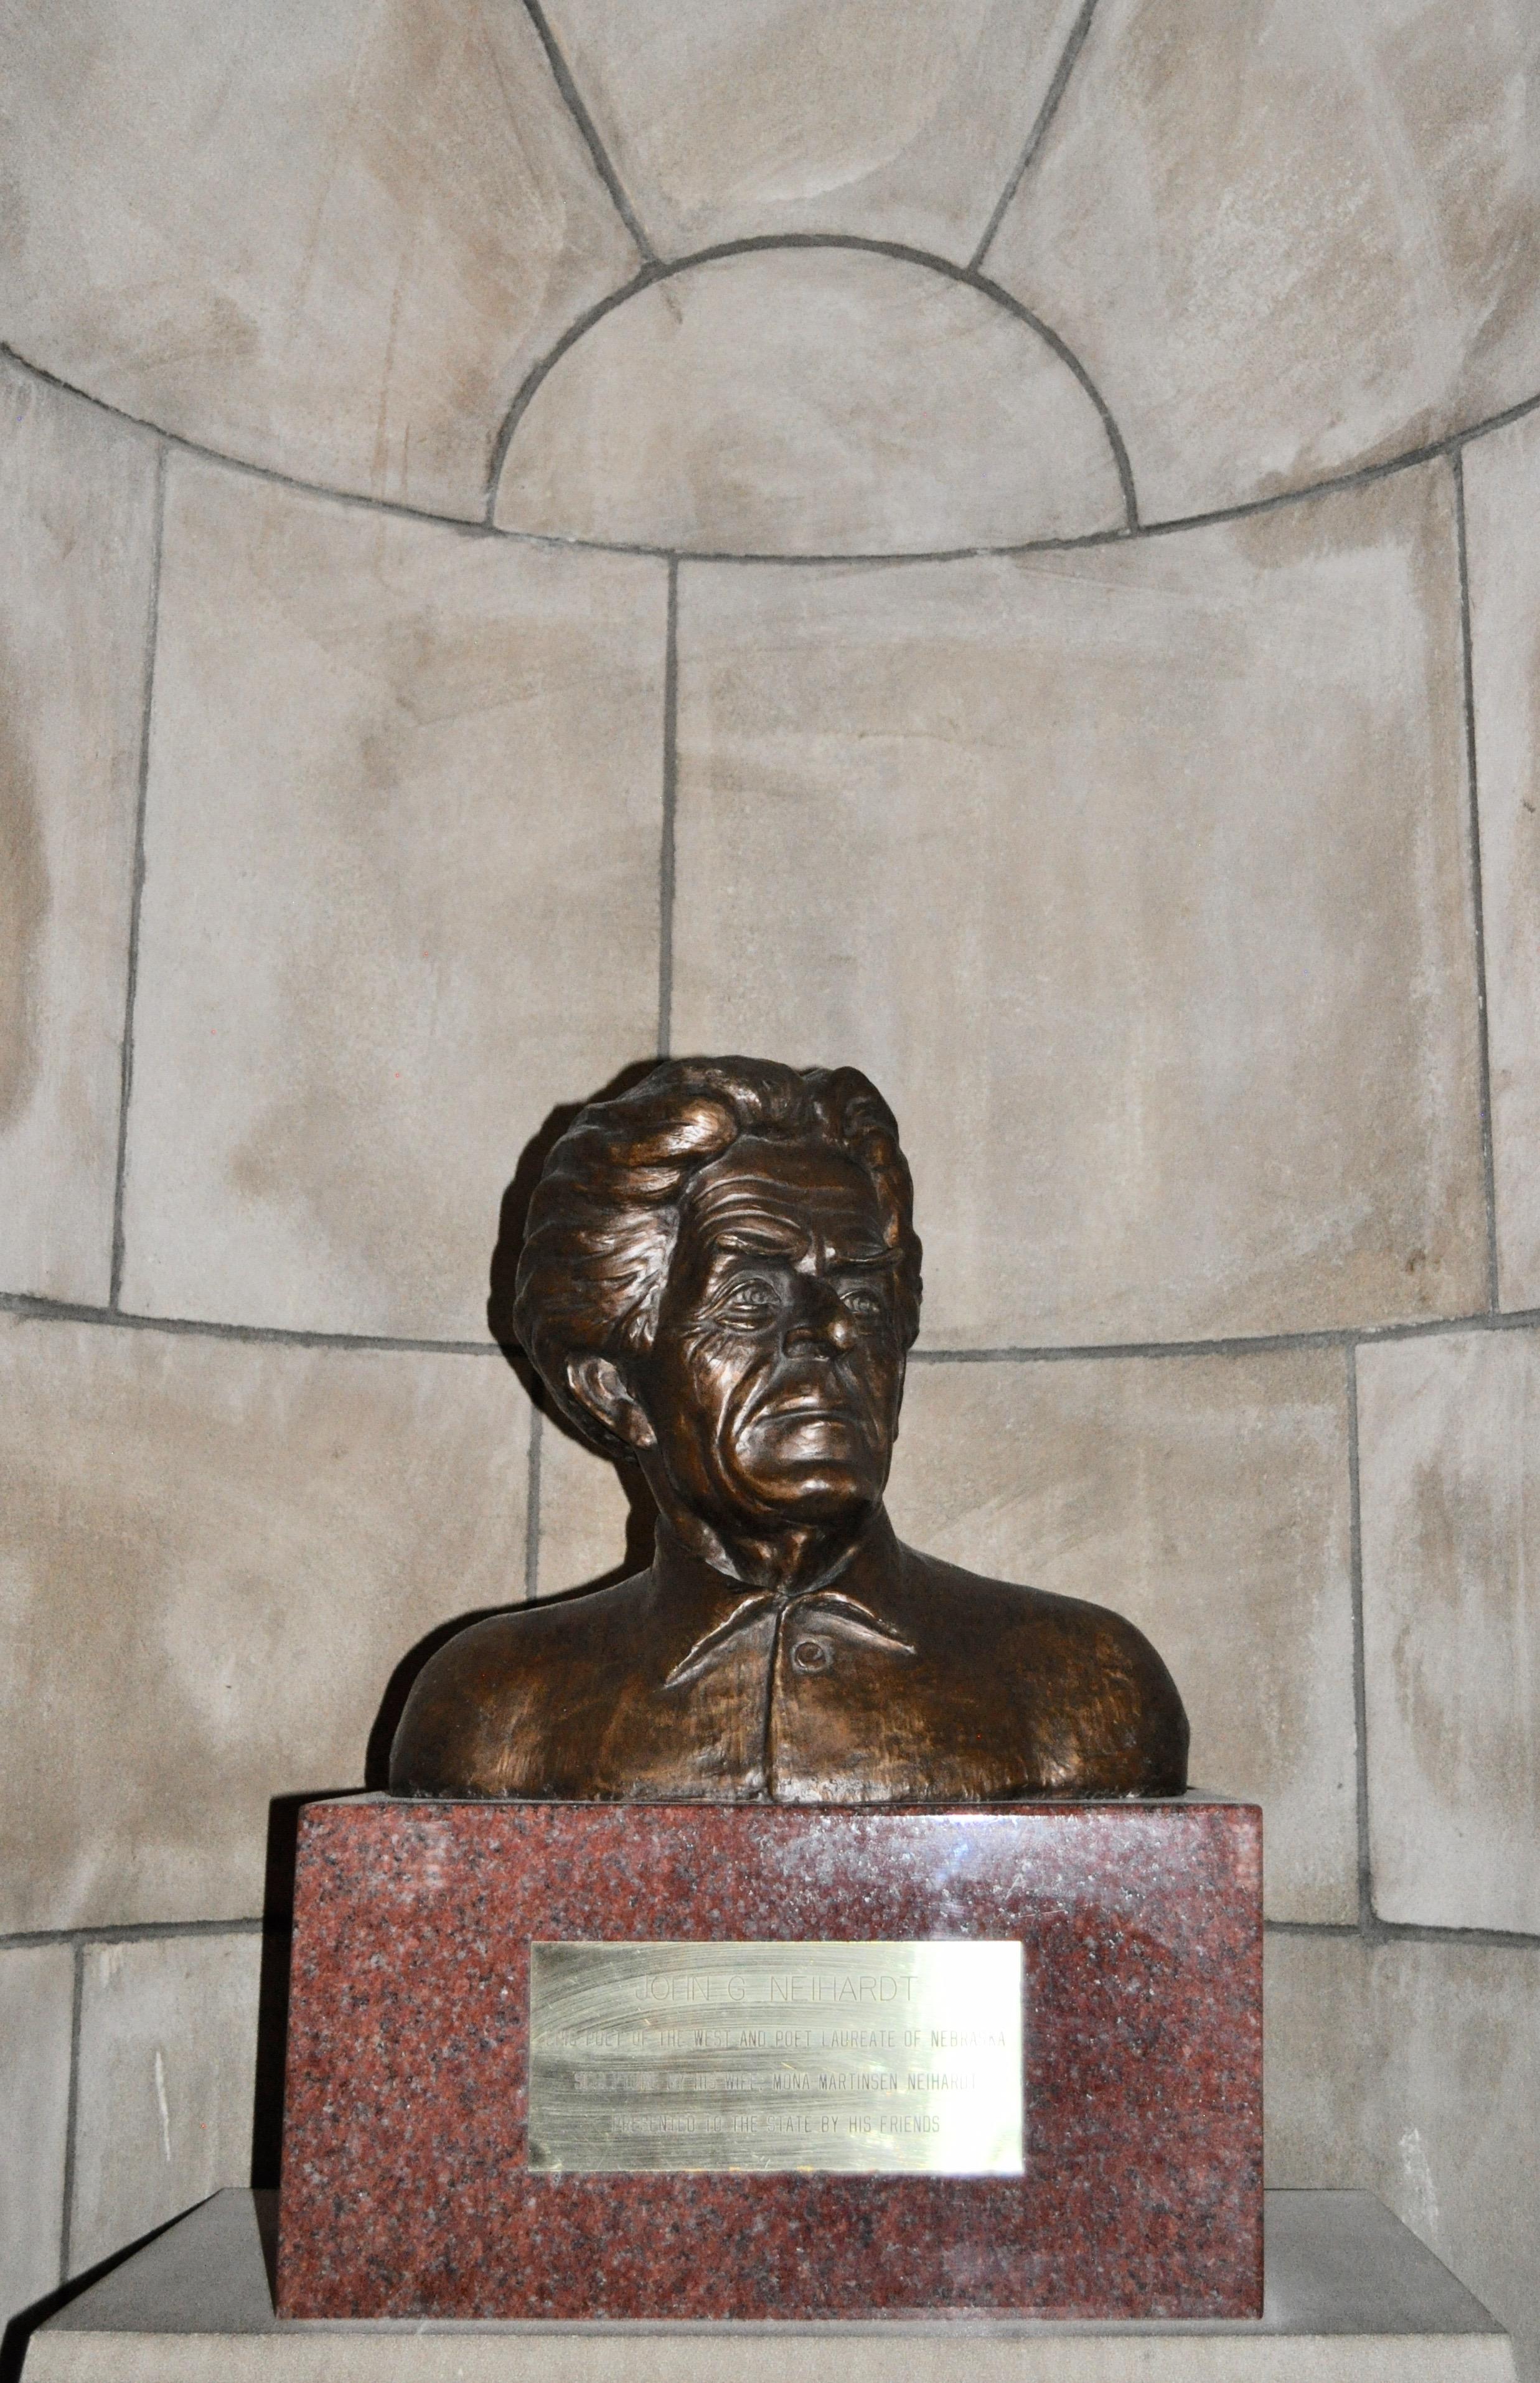 File:John G. Neihardt bust2.jpg - Wikimedia Commons